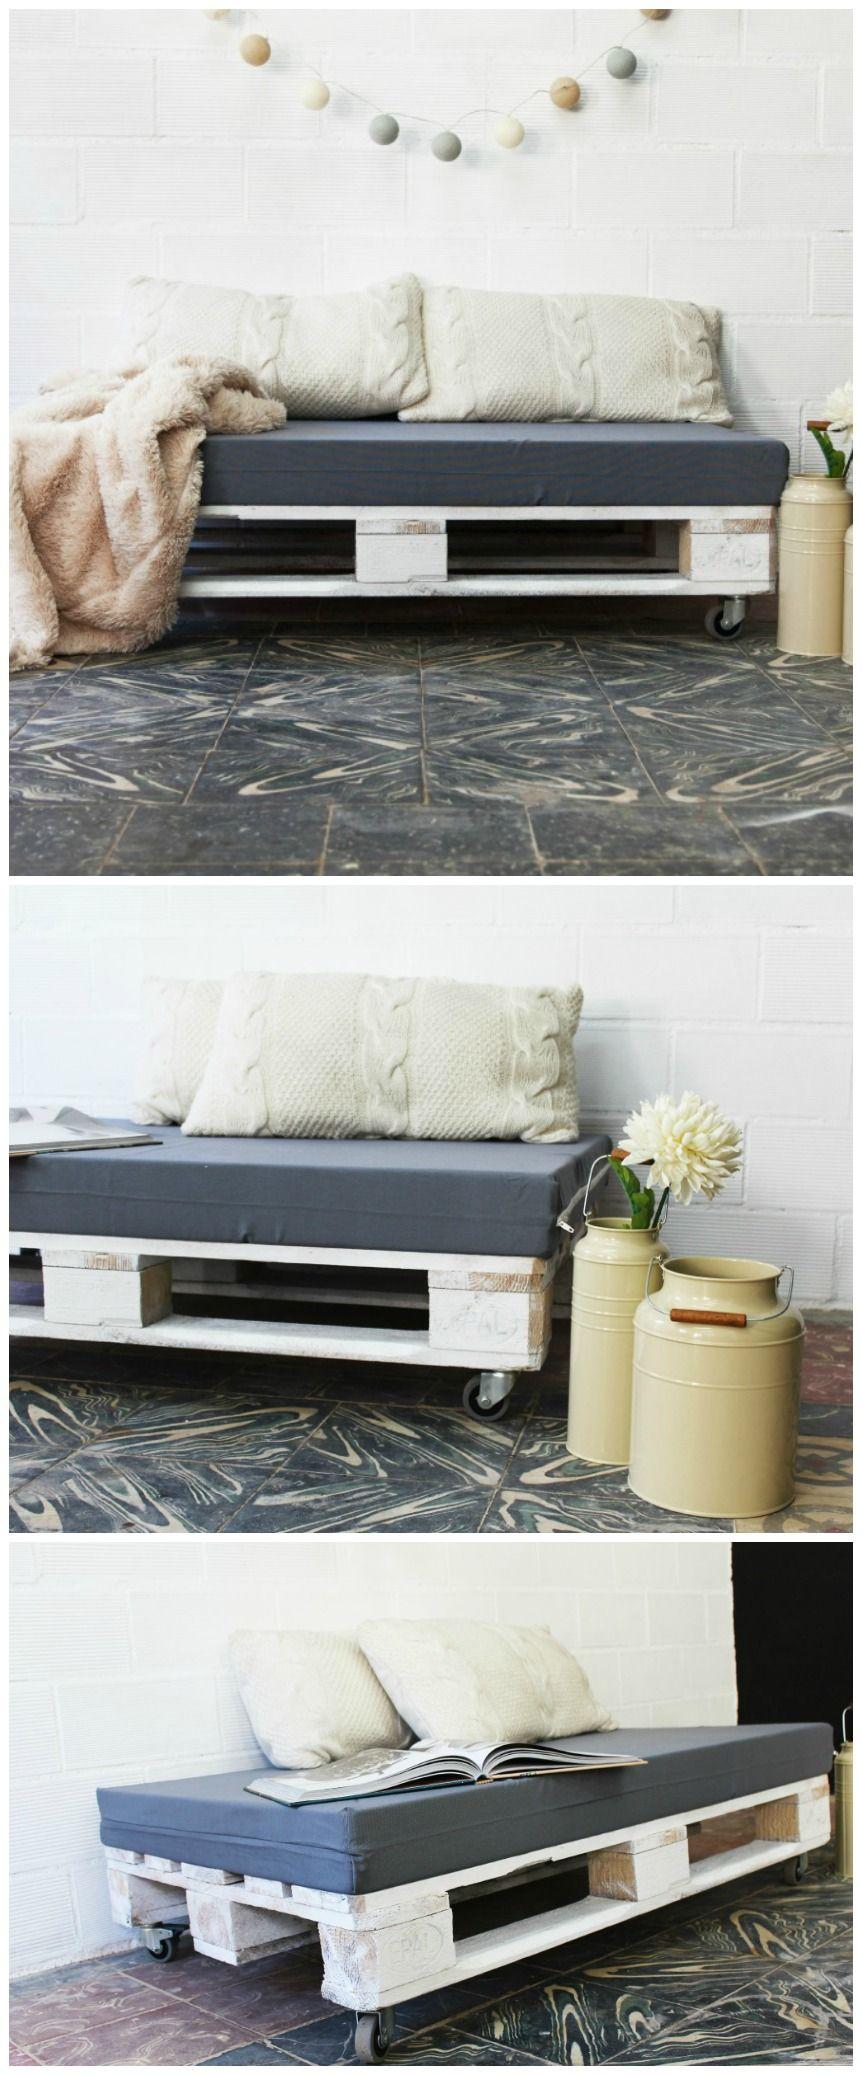 Aneto puf palets 120x80cm muebles con palets - Mesas de pale ...